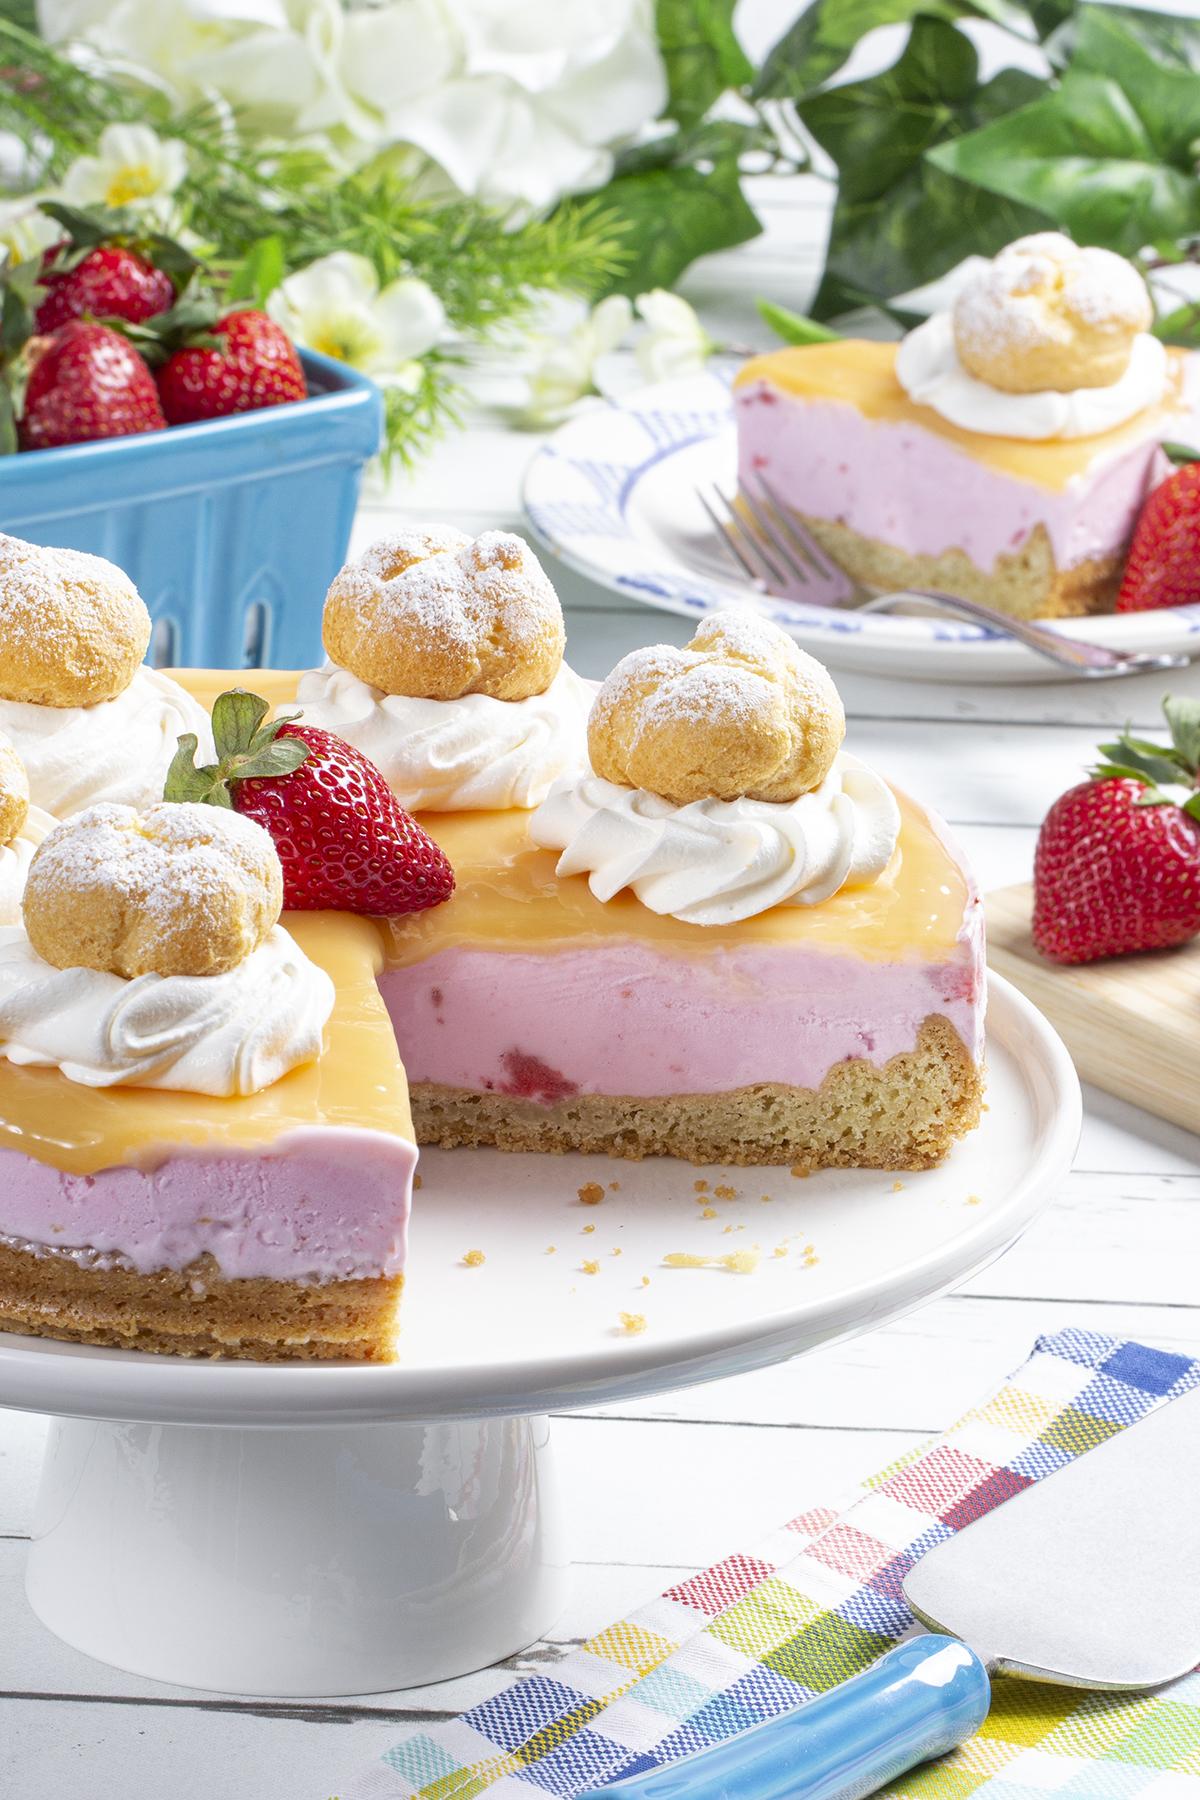 MFTK Strawberry Lemon Ice Cream Tart